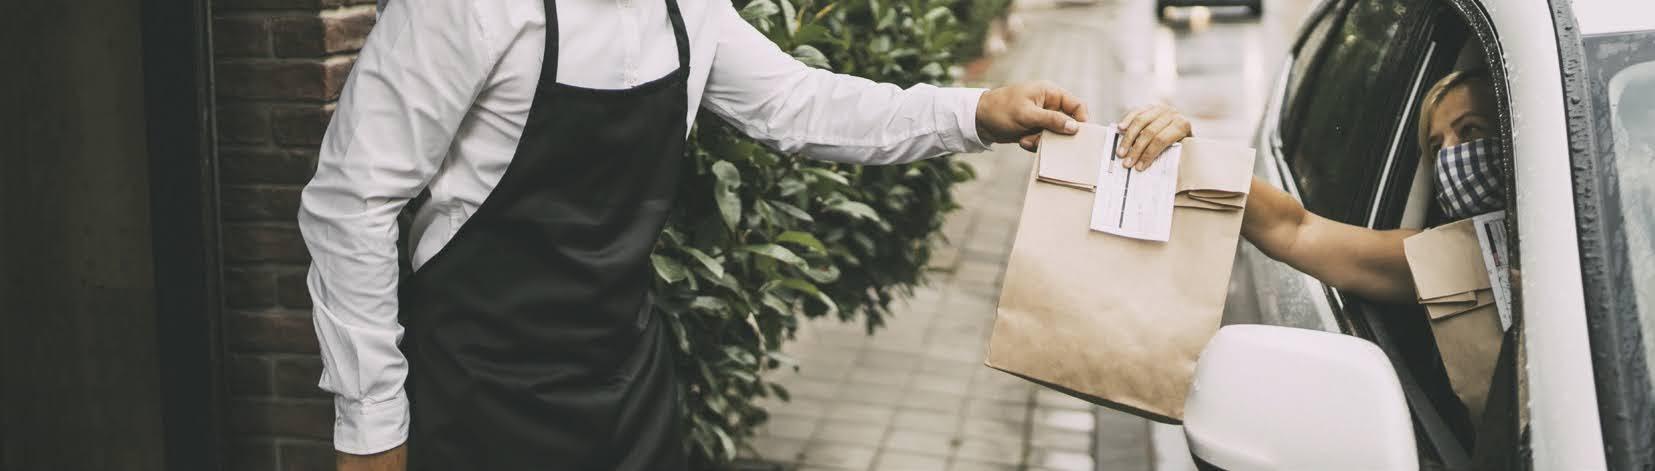 3 Principles Driving Digital Innovation in Retail